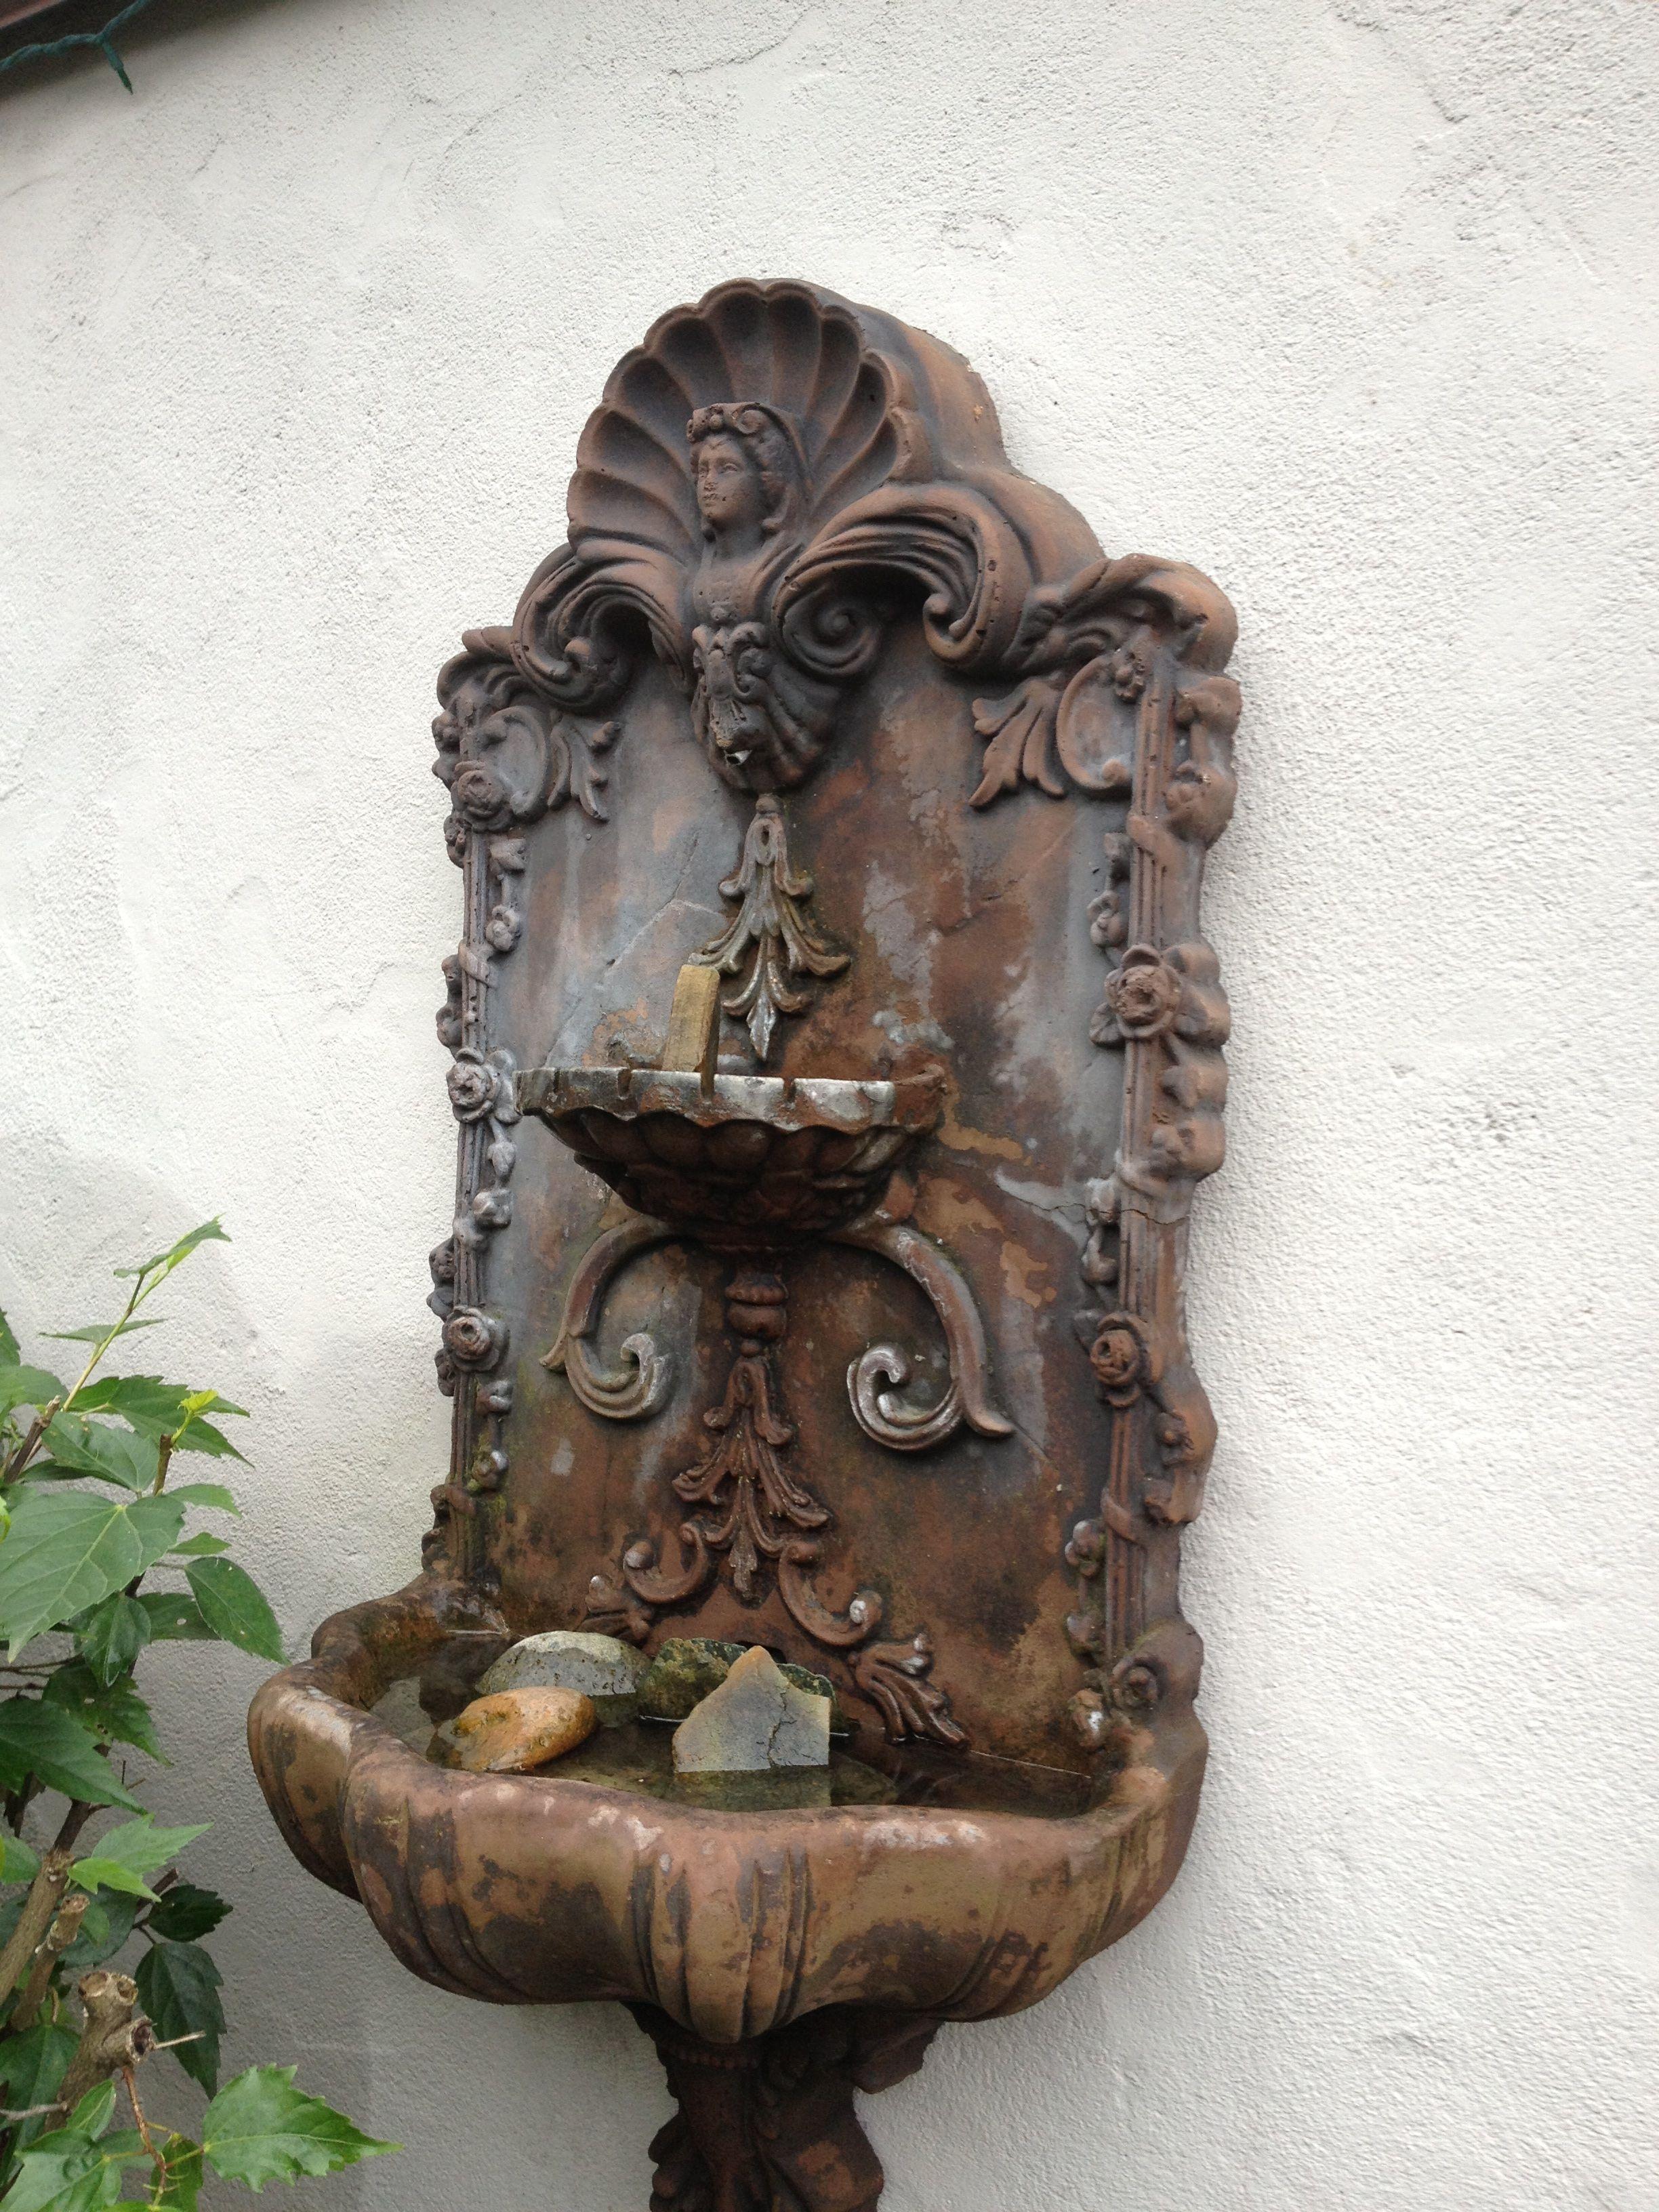 Fountain Board Has Many Water Garden Sound Ideas Wall